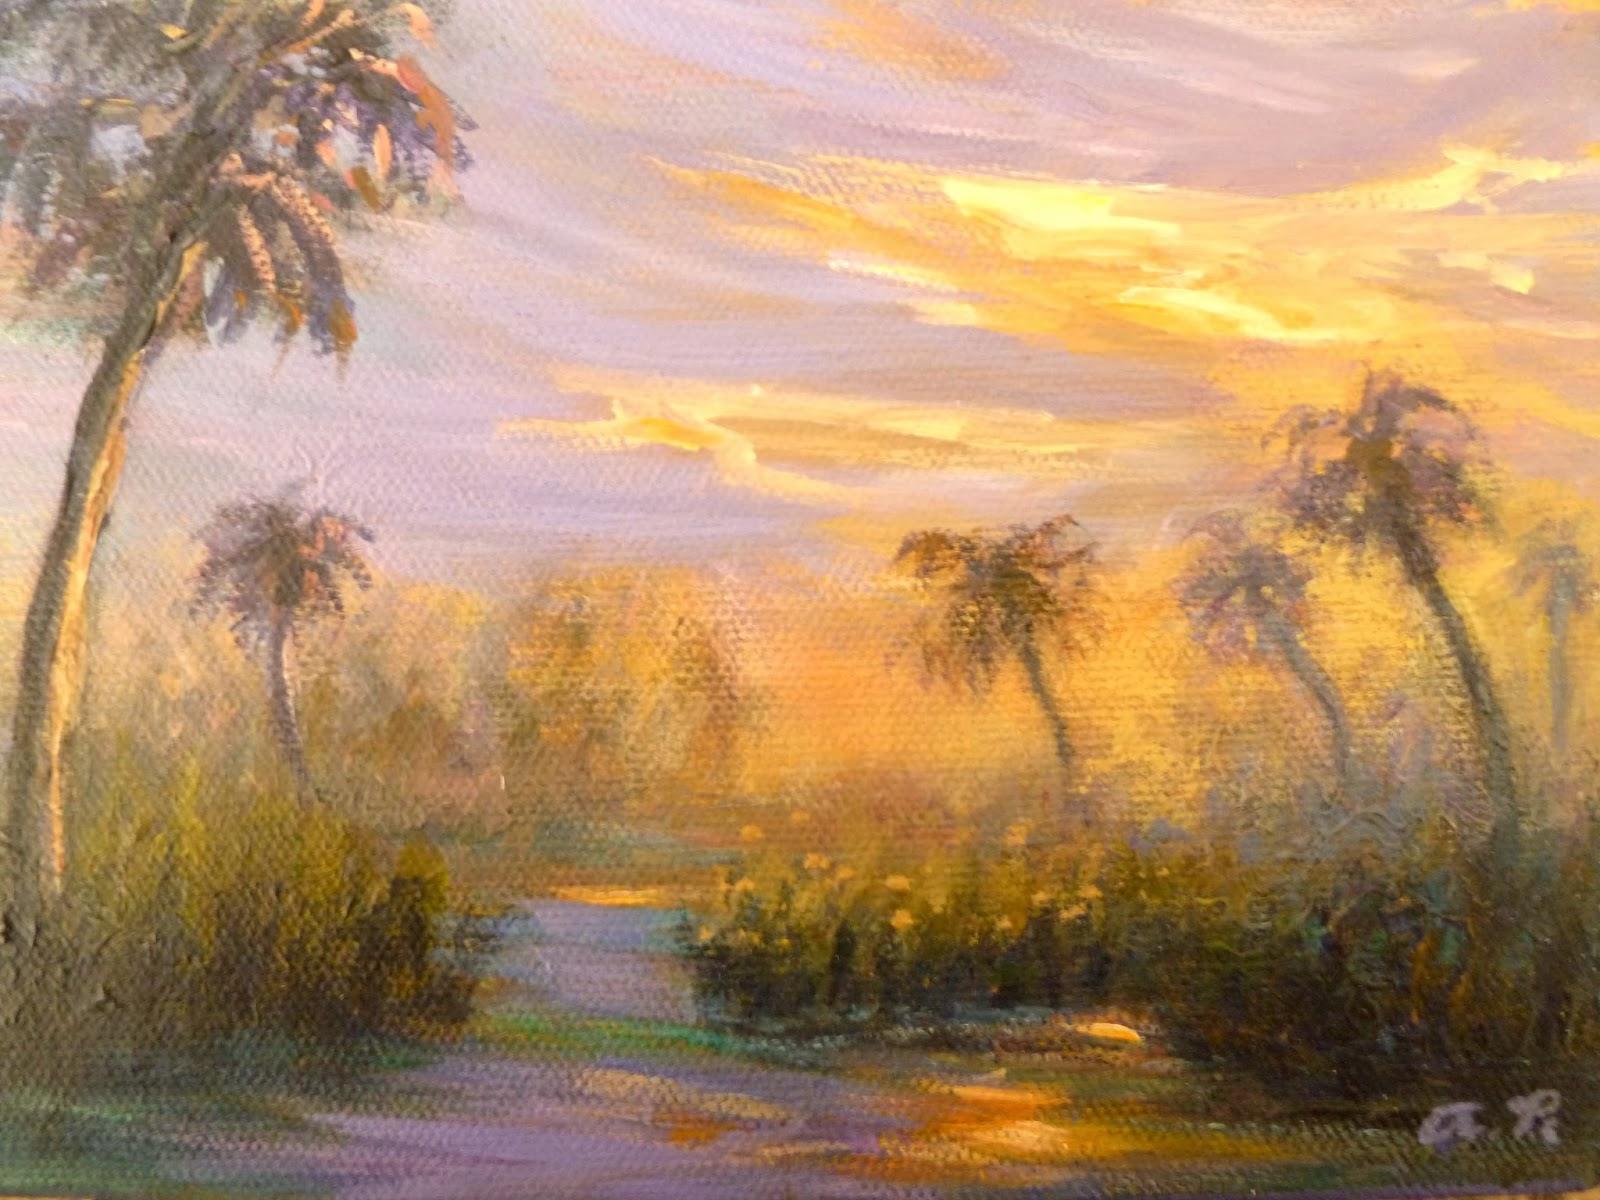 Marsh at sunset painting